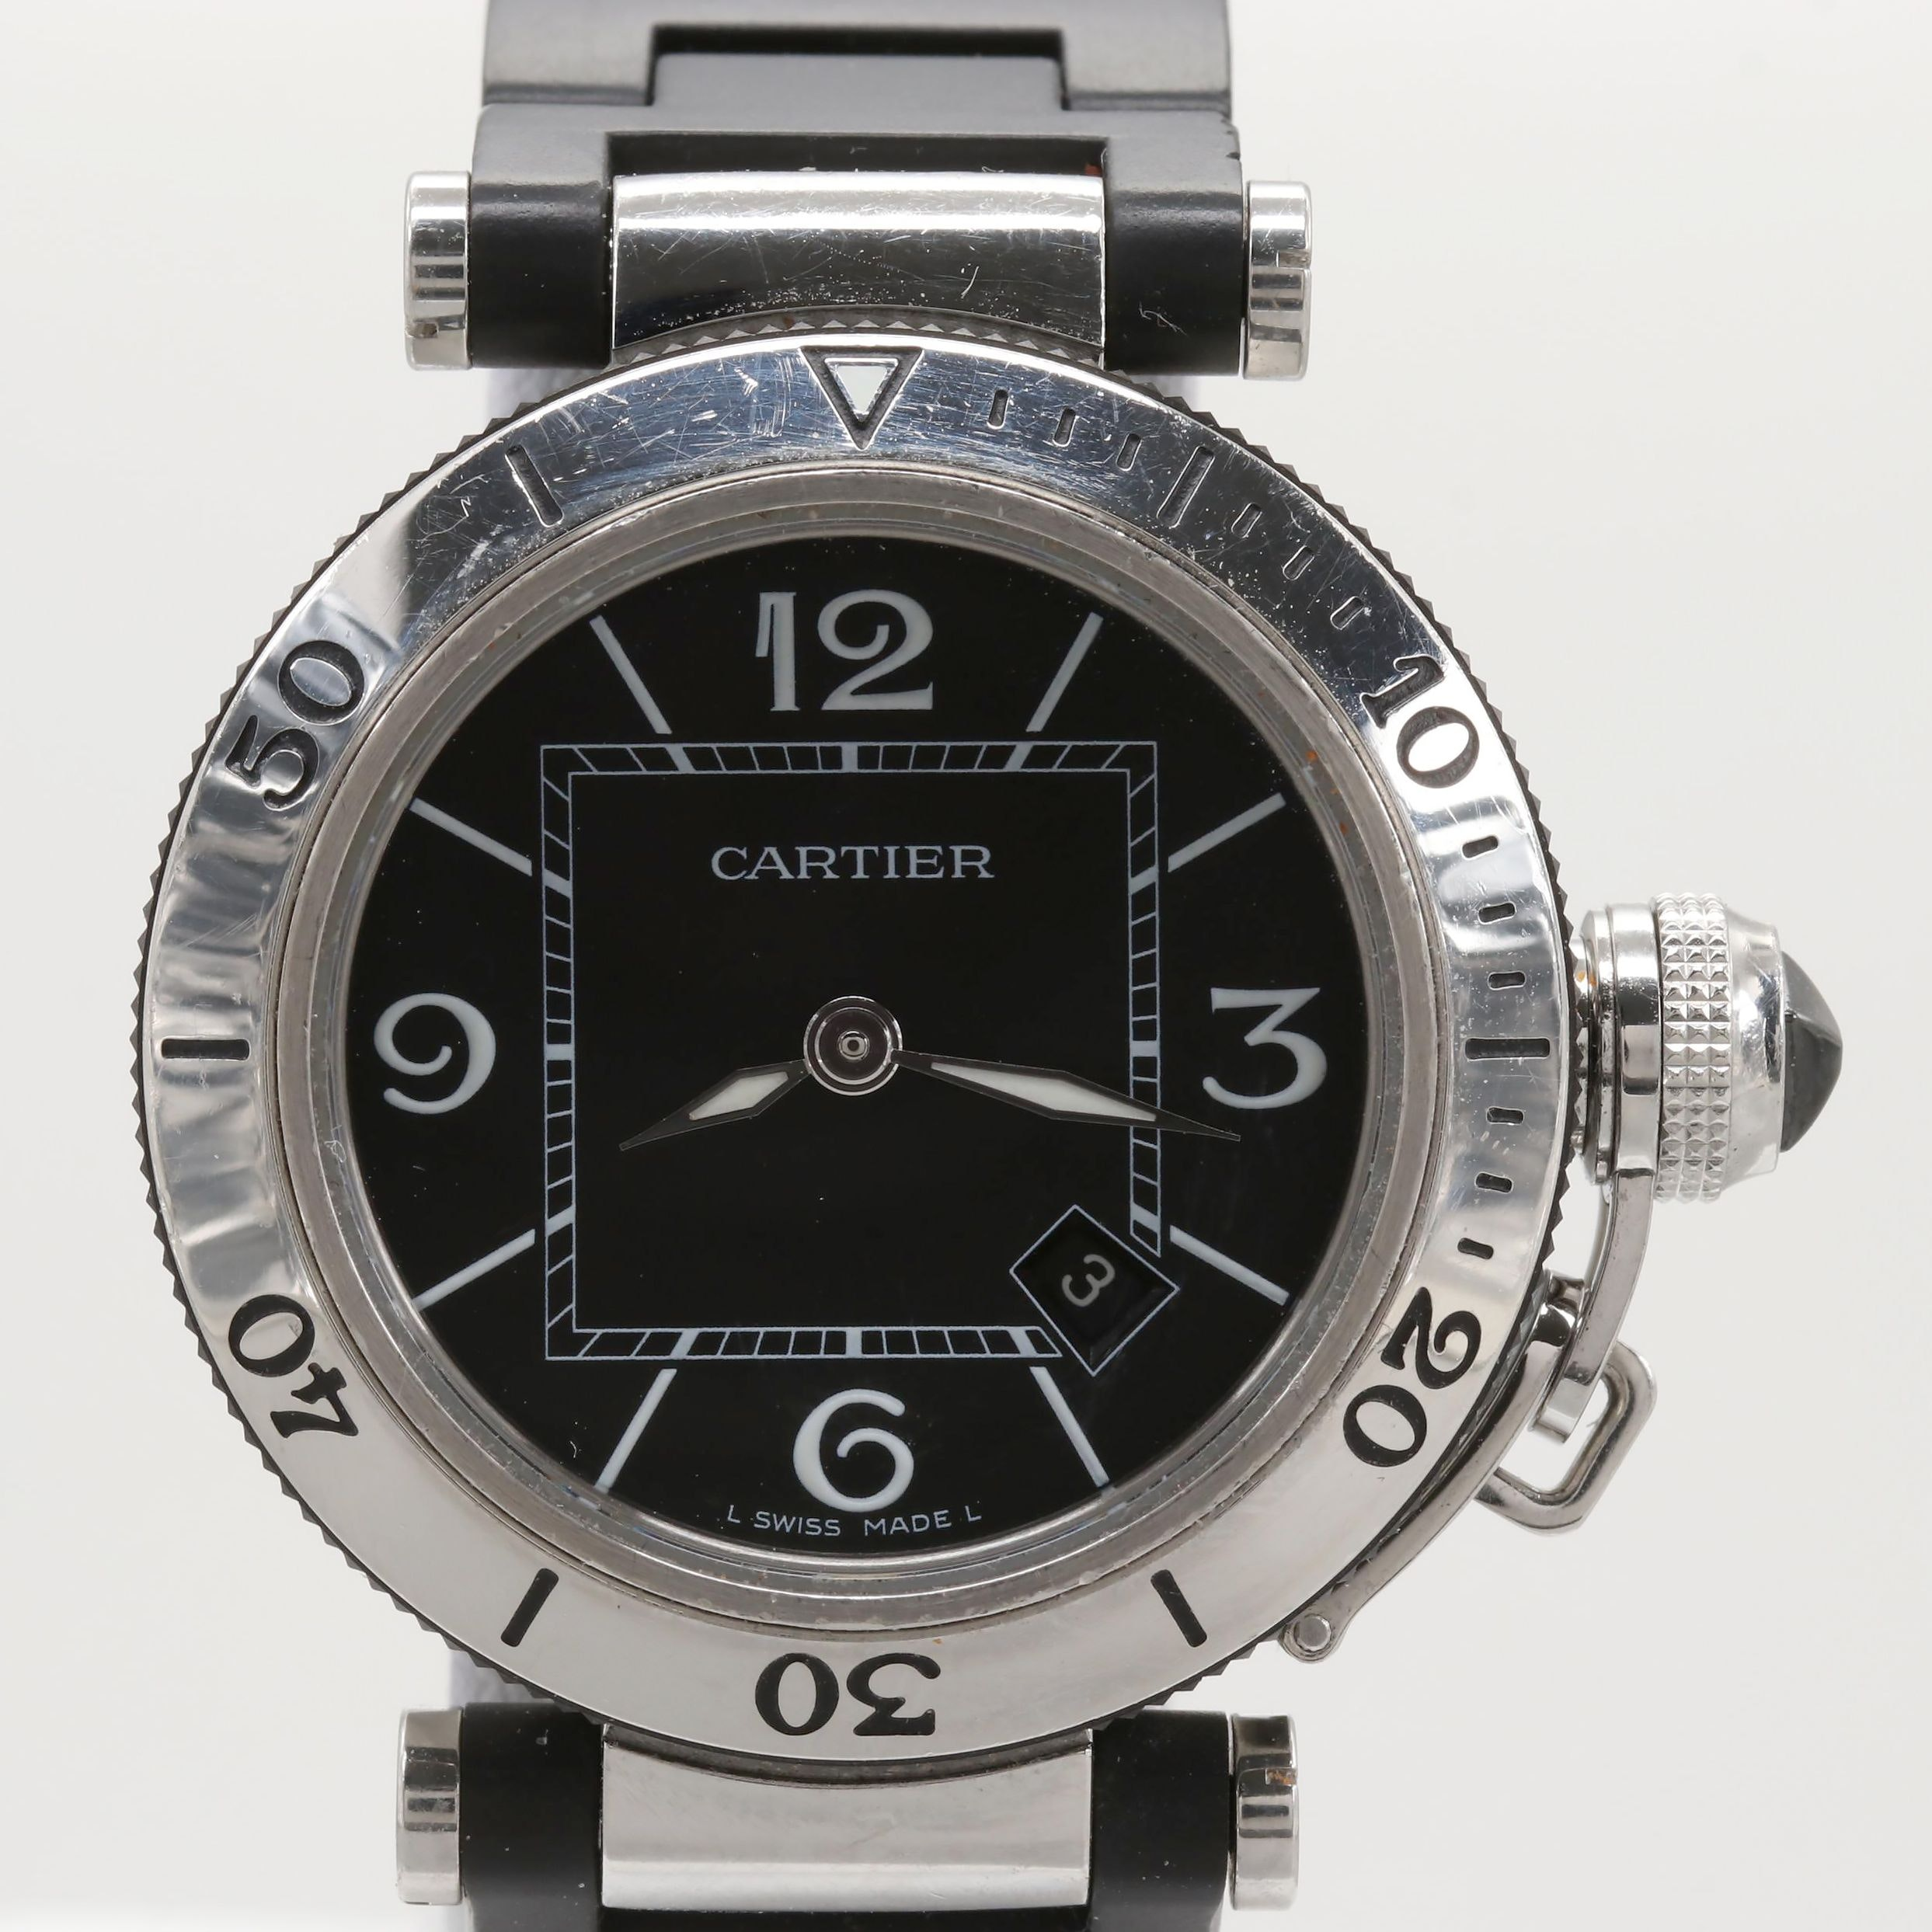 Pasha de Cartier Seatimer Stainless Steel Wristwatch With Date Window